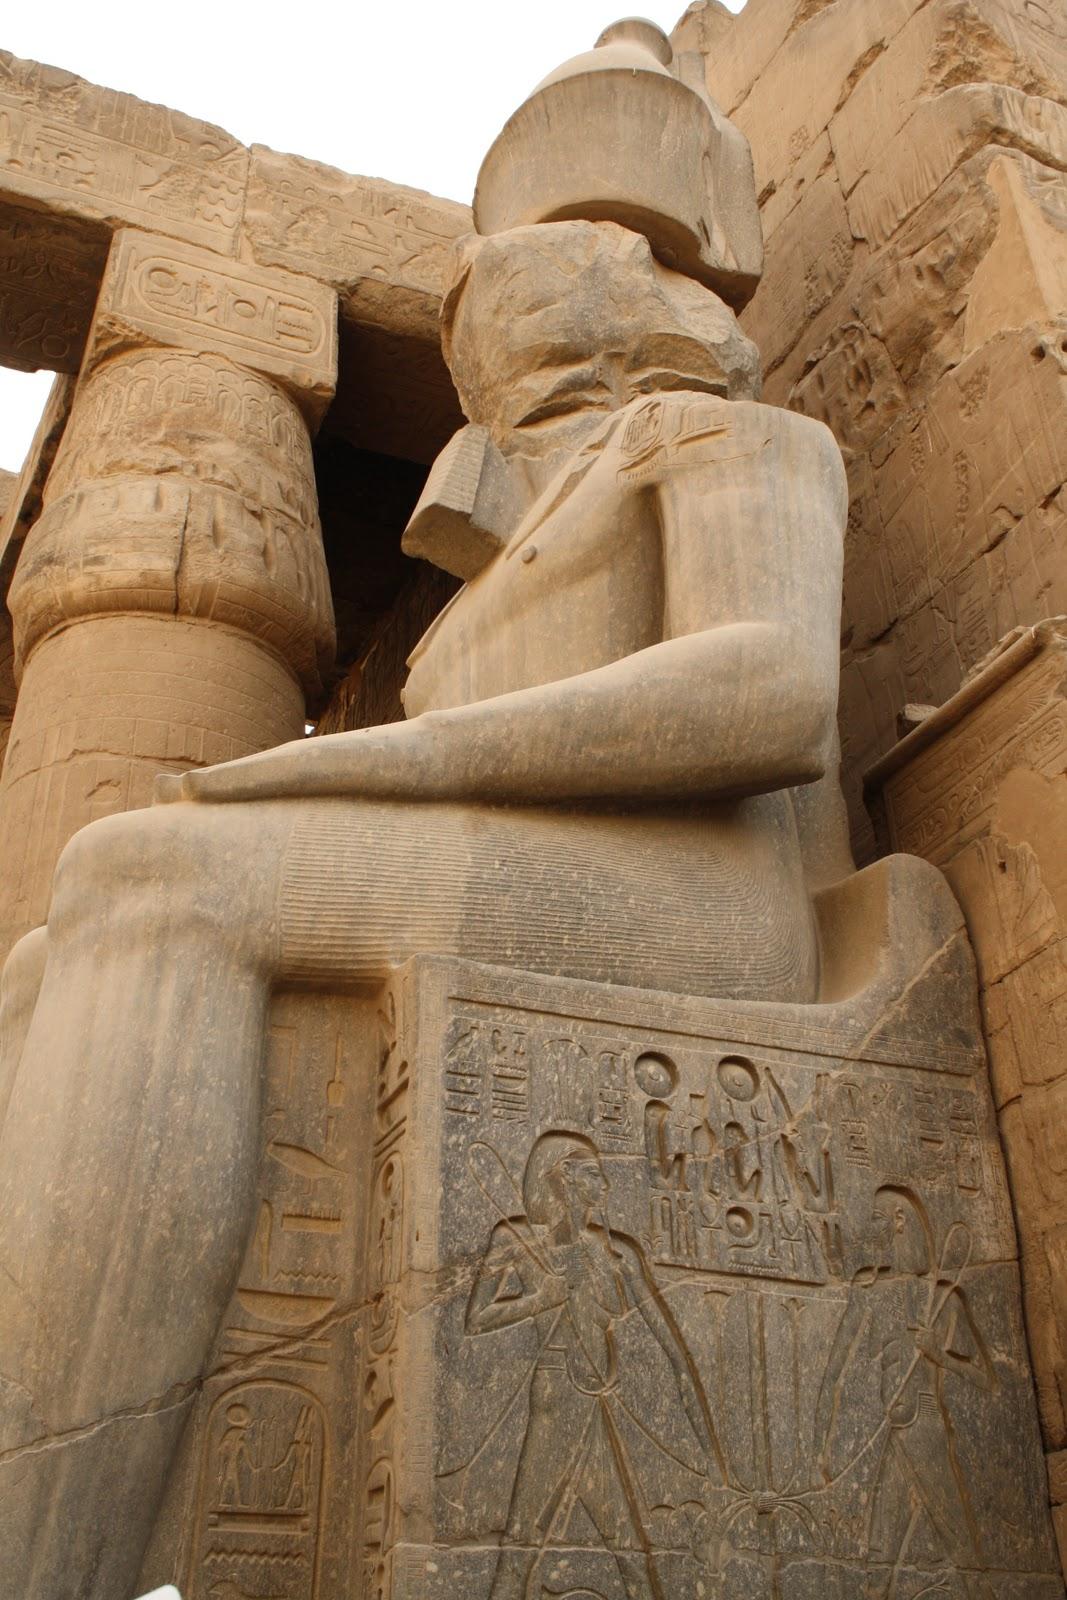 http://2.bp.blogspot.com/_DmnL4XZPw-A/TOweCmDOADI/AAAAAAAAAWY/UElzuOeOUL4/s1600/Egypt+2010+203.JPG